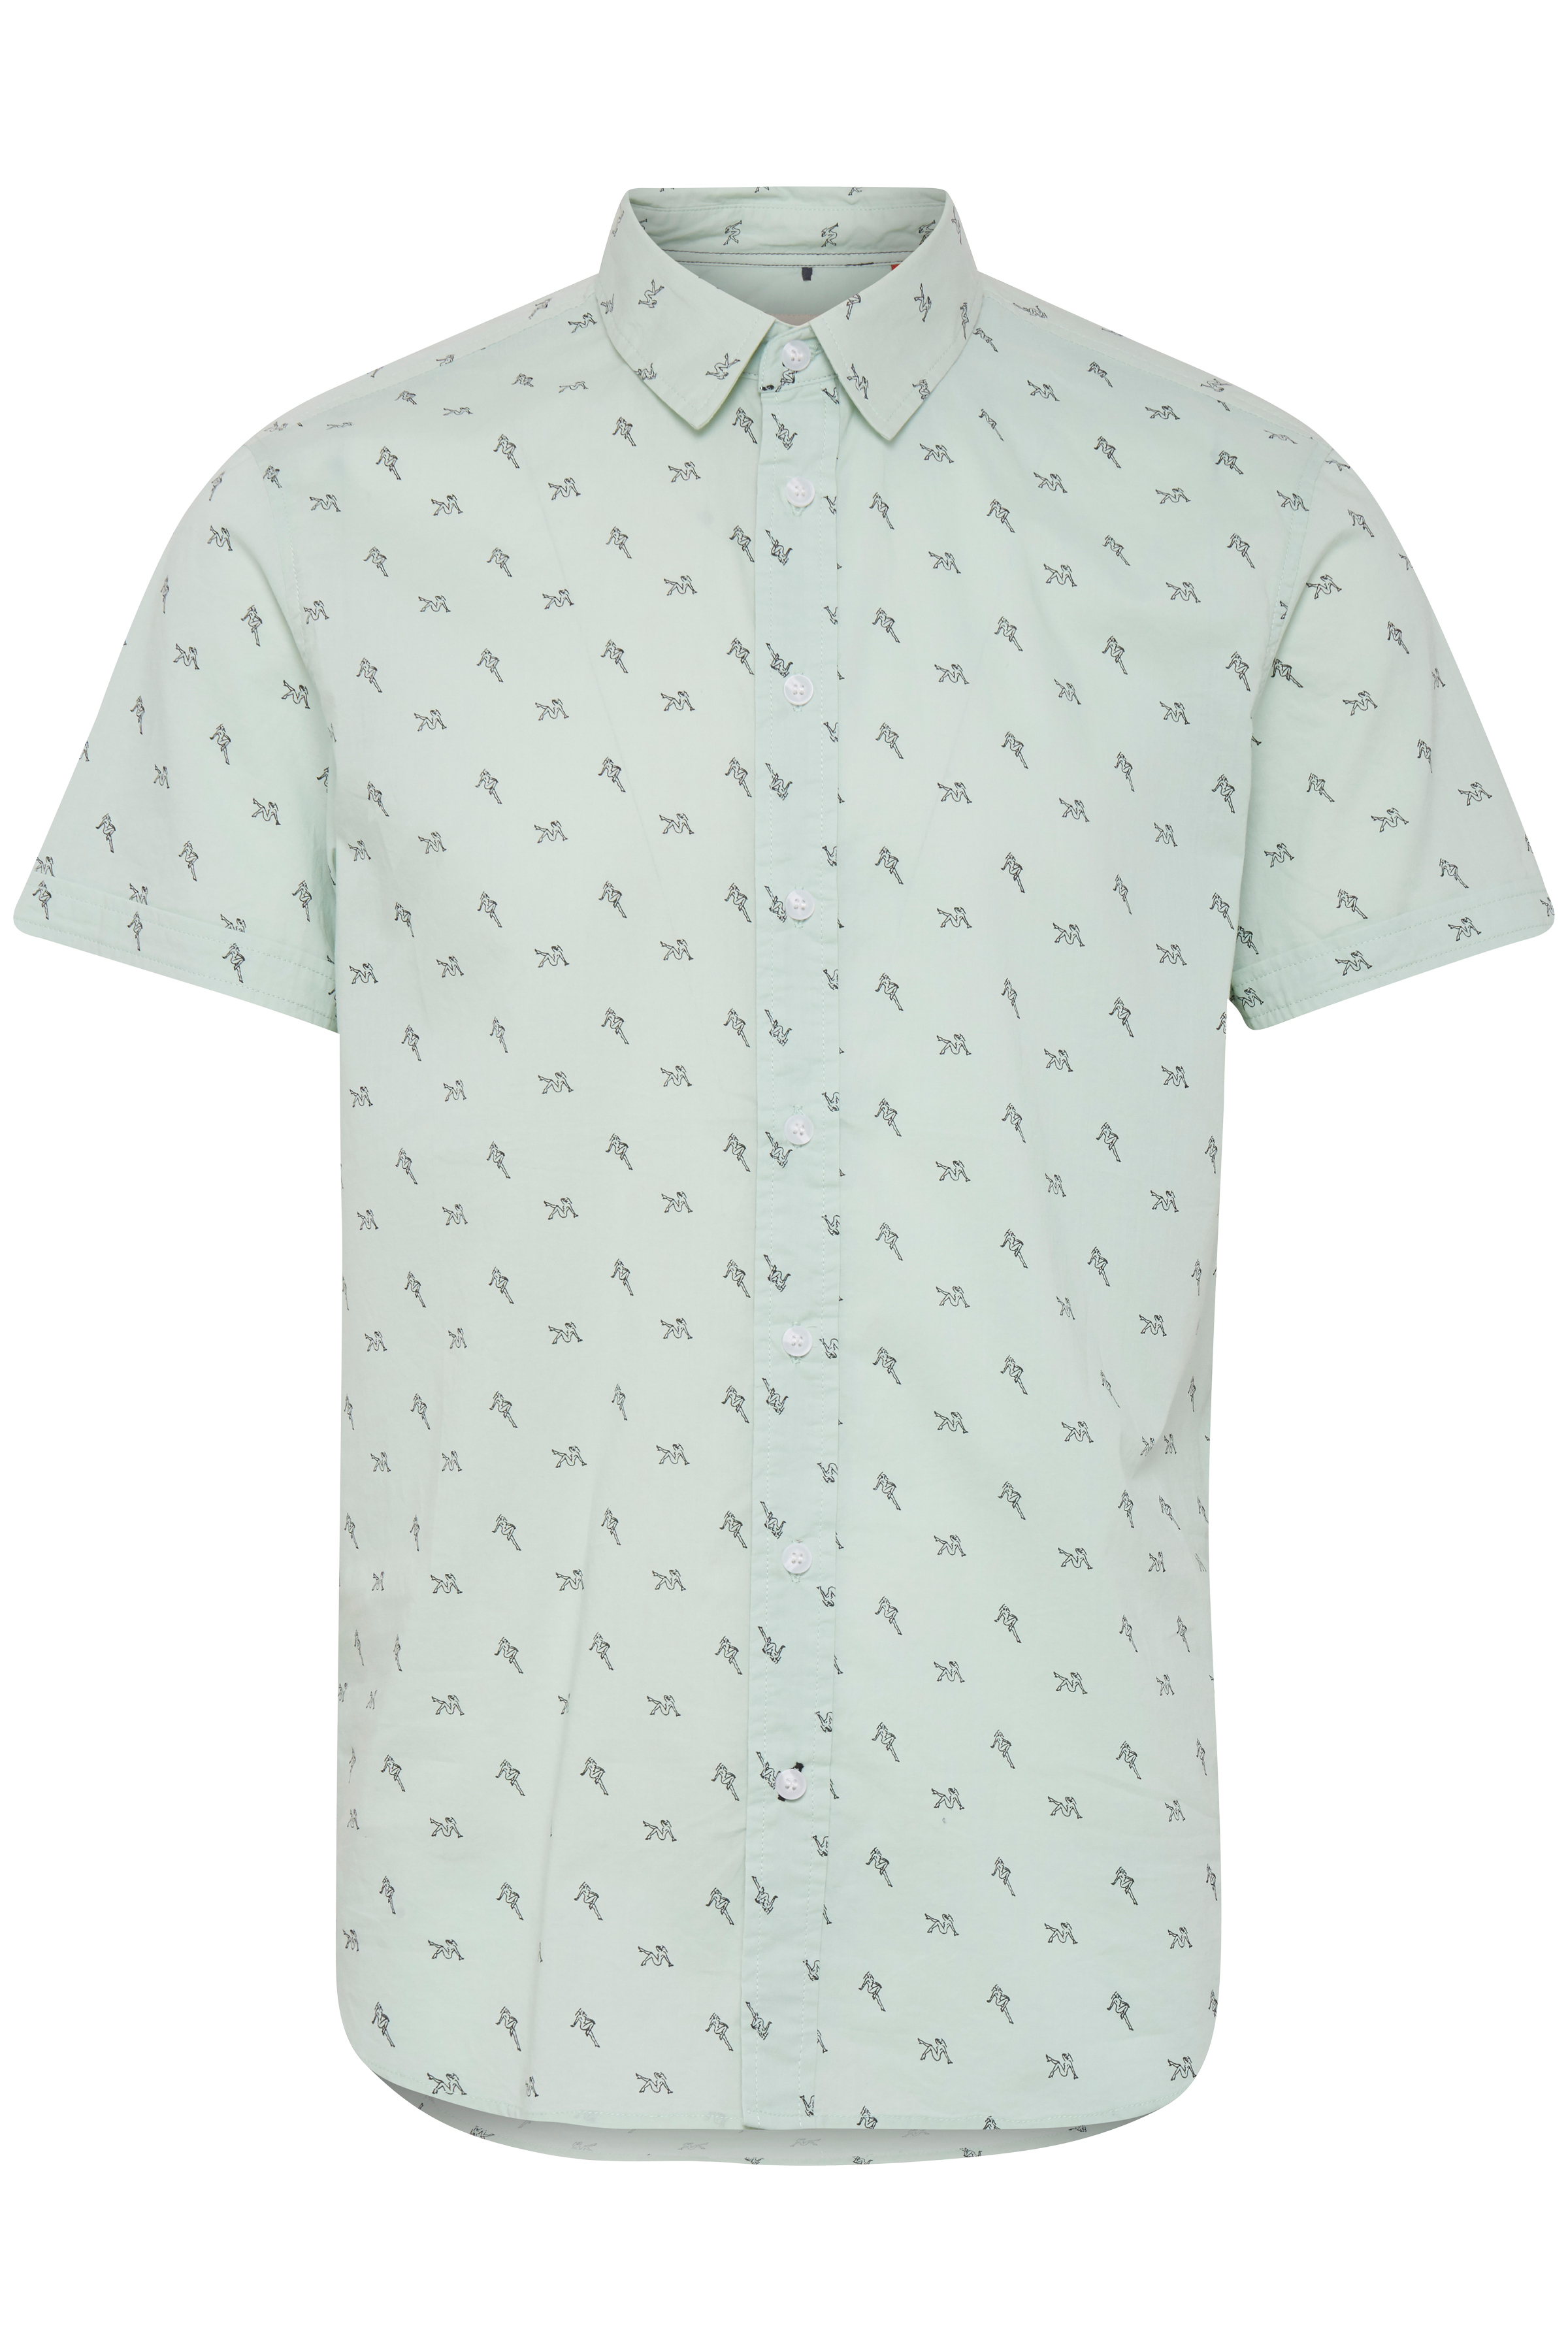 Foam Green Skjorte – Køb Foam Green Skjorte fra str. S-XL her